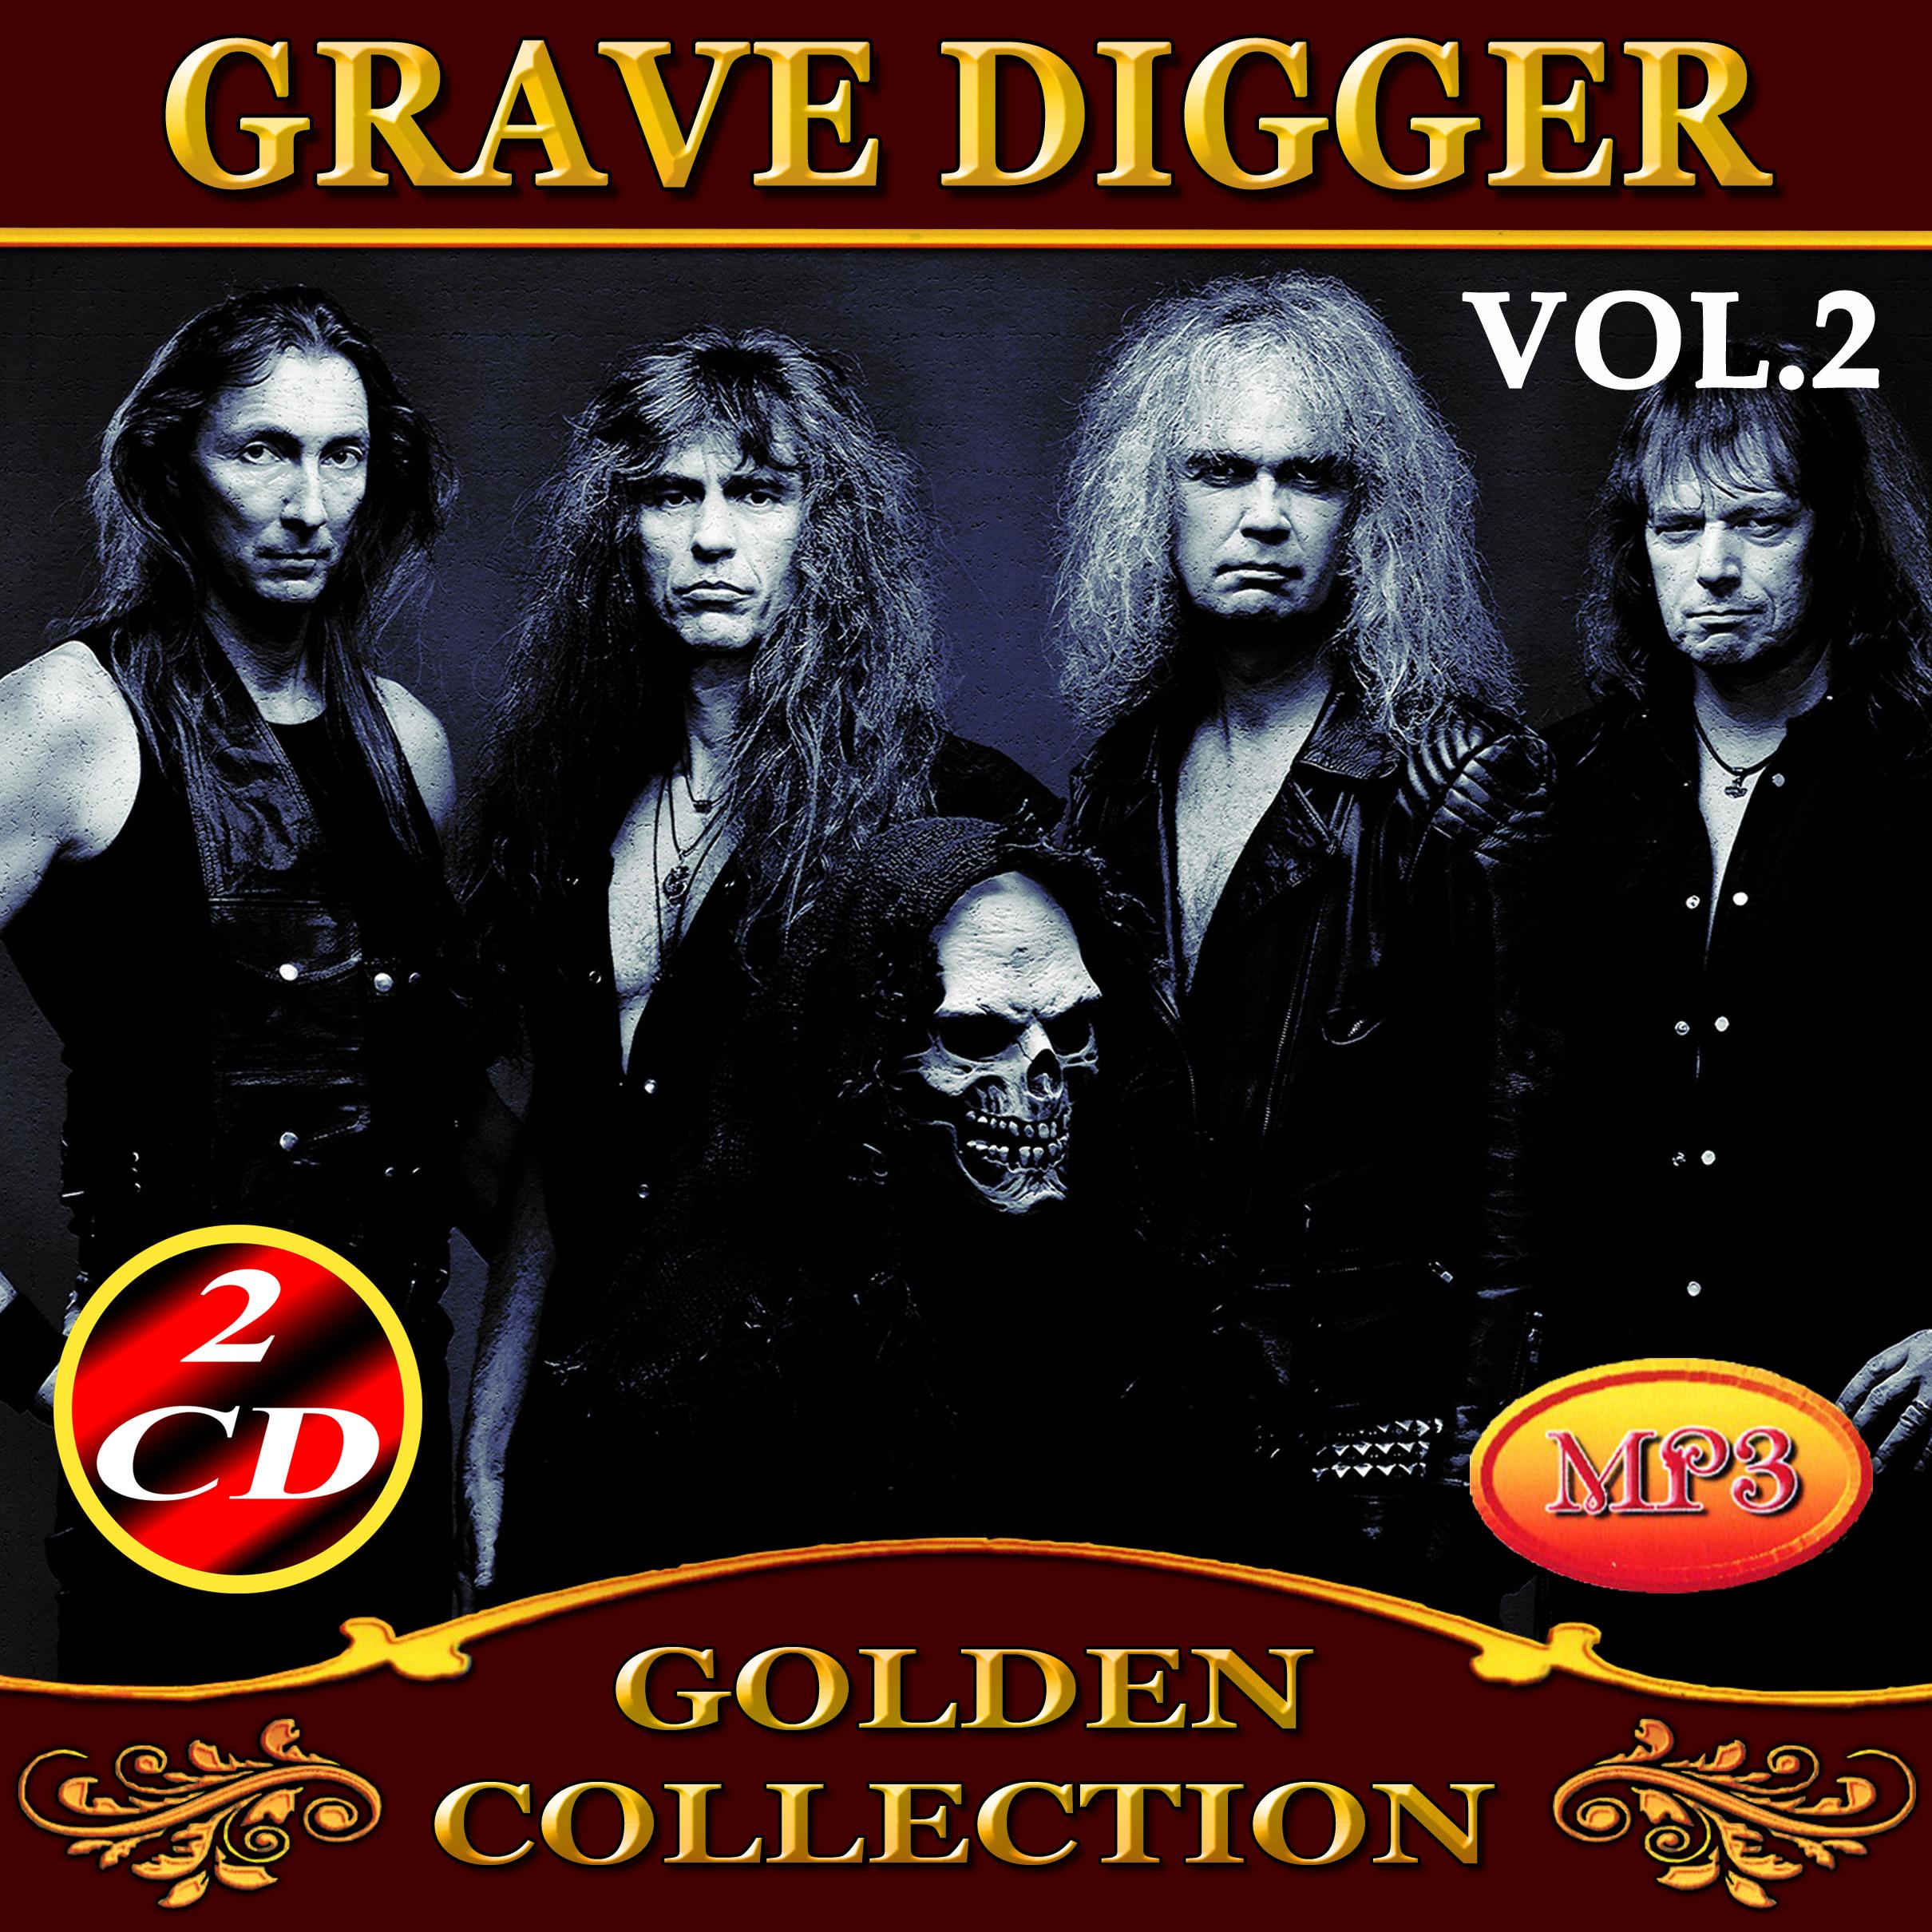 Grave Digger 2ч2cd [mp3]